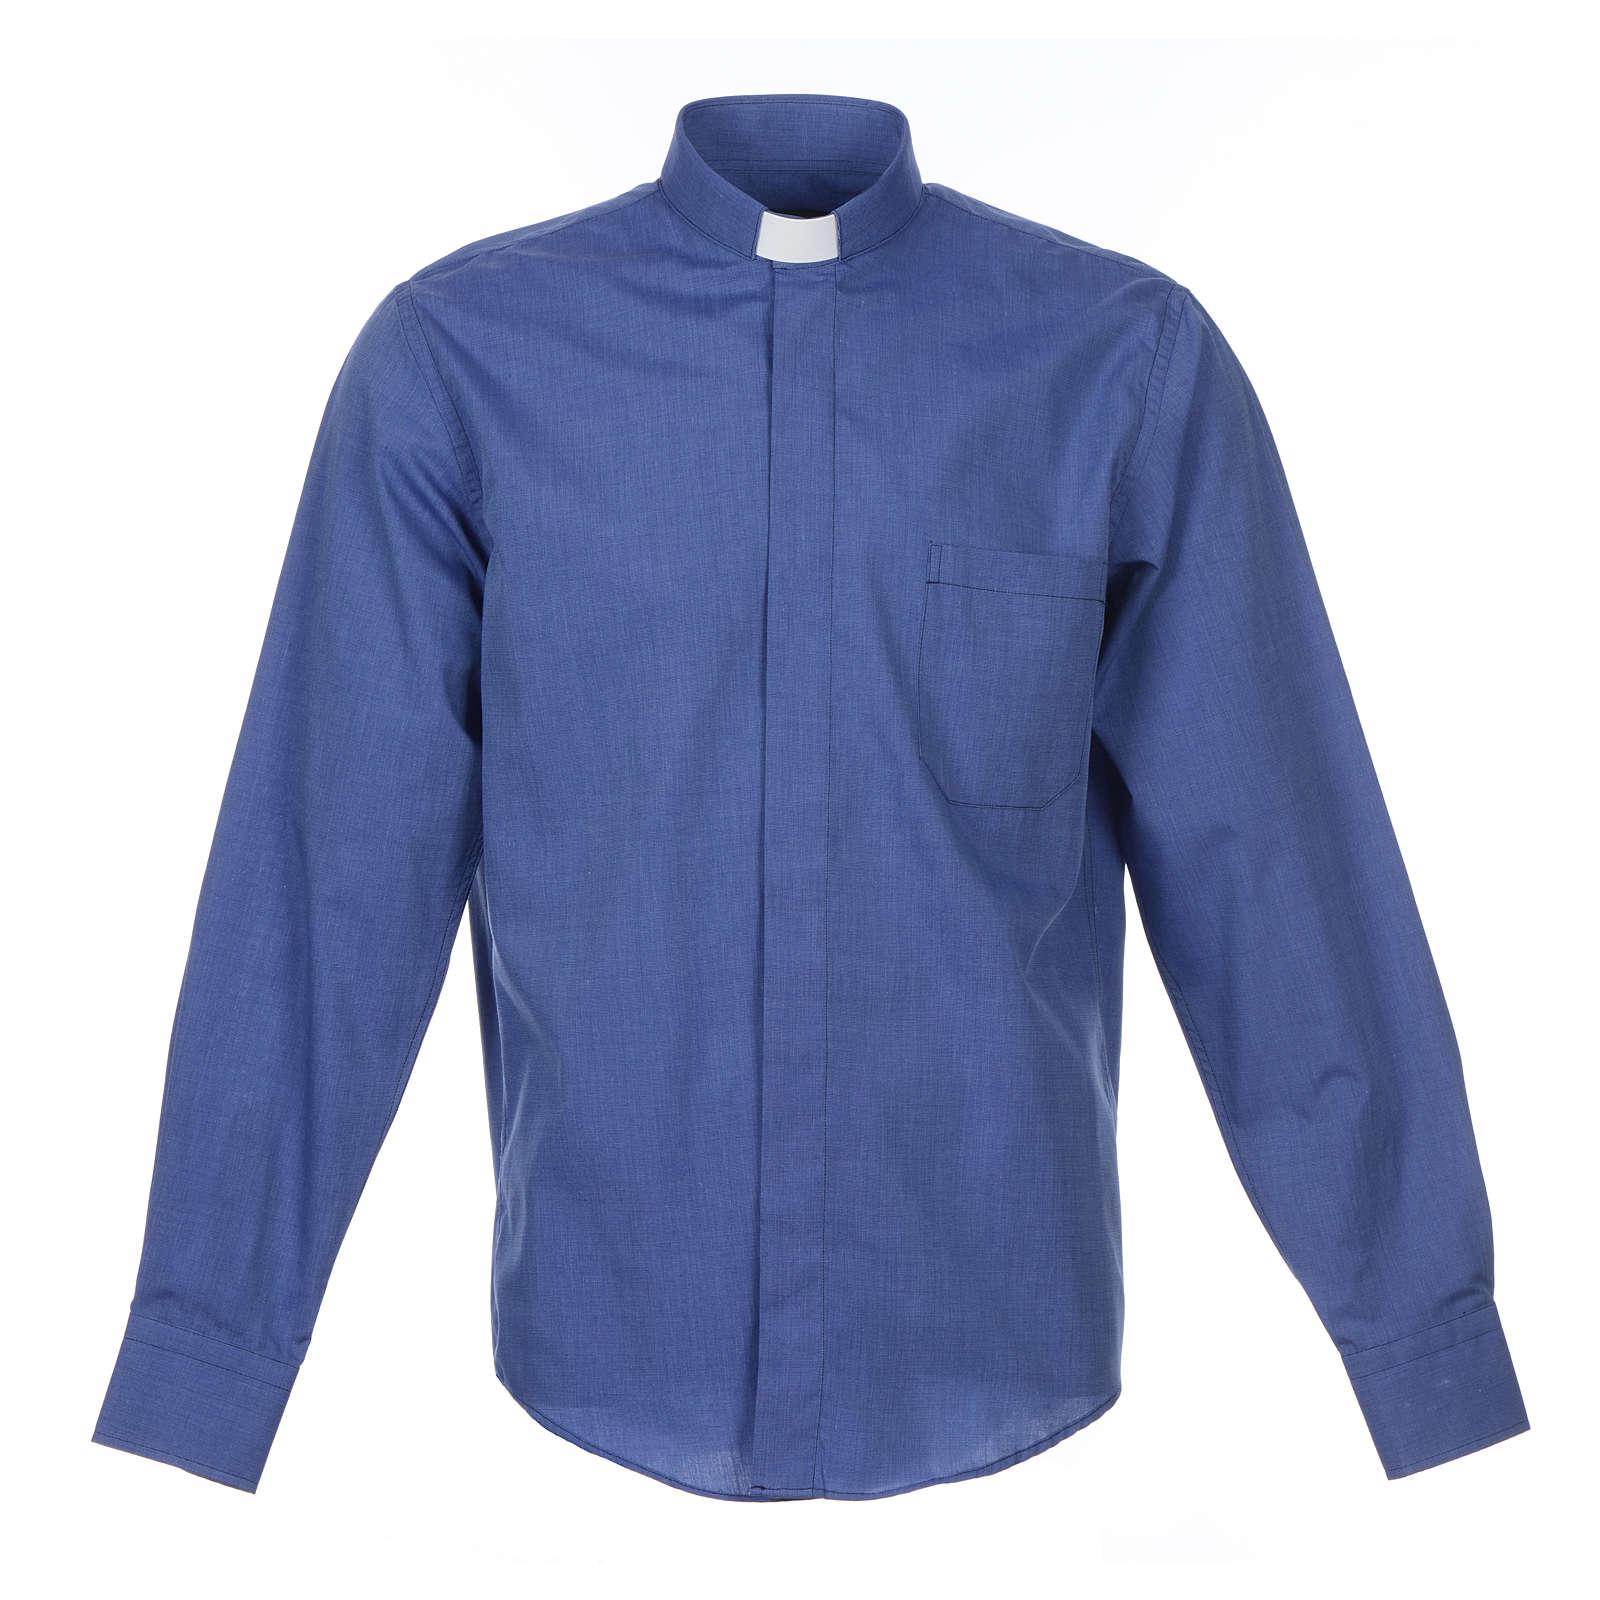 Clerical shirt long sleeves fil-à-fil mixed cotton, blue 4